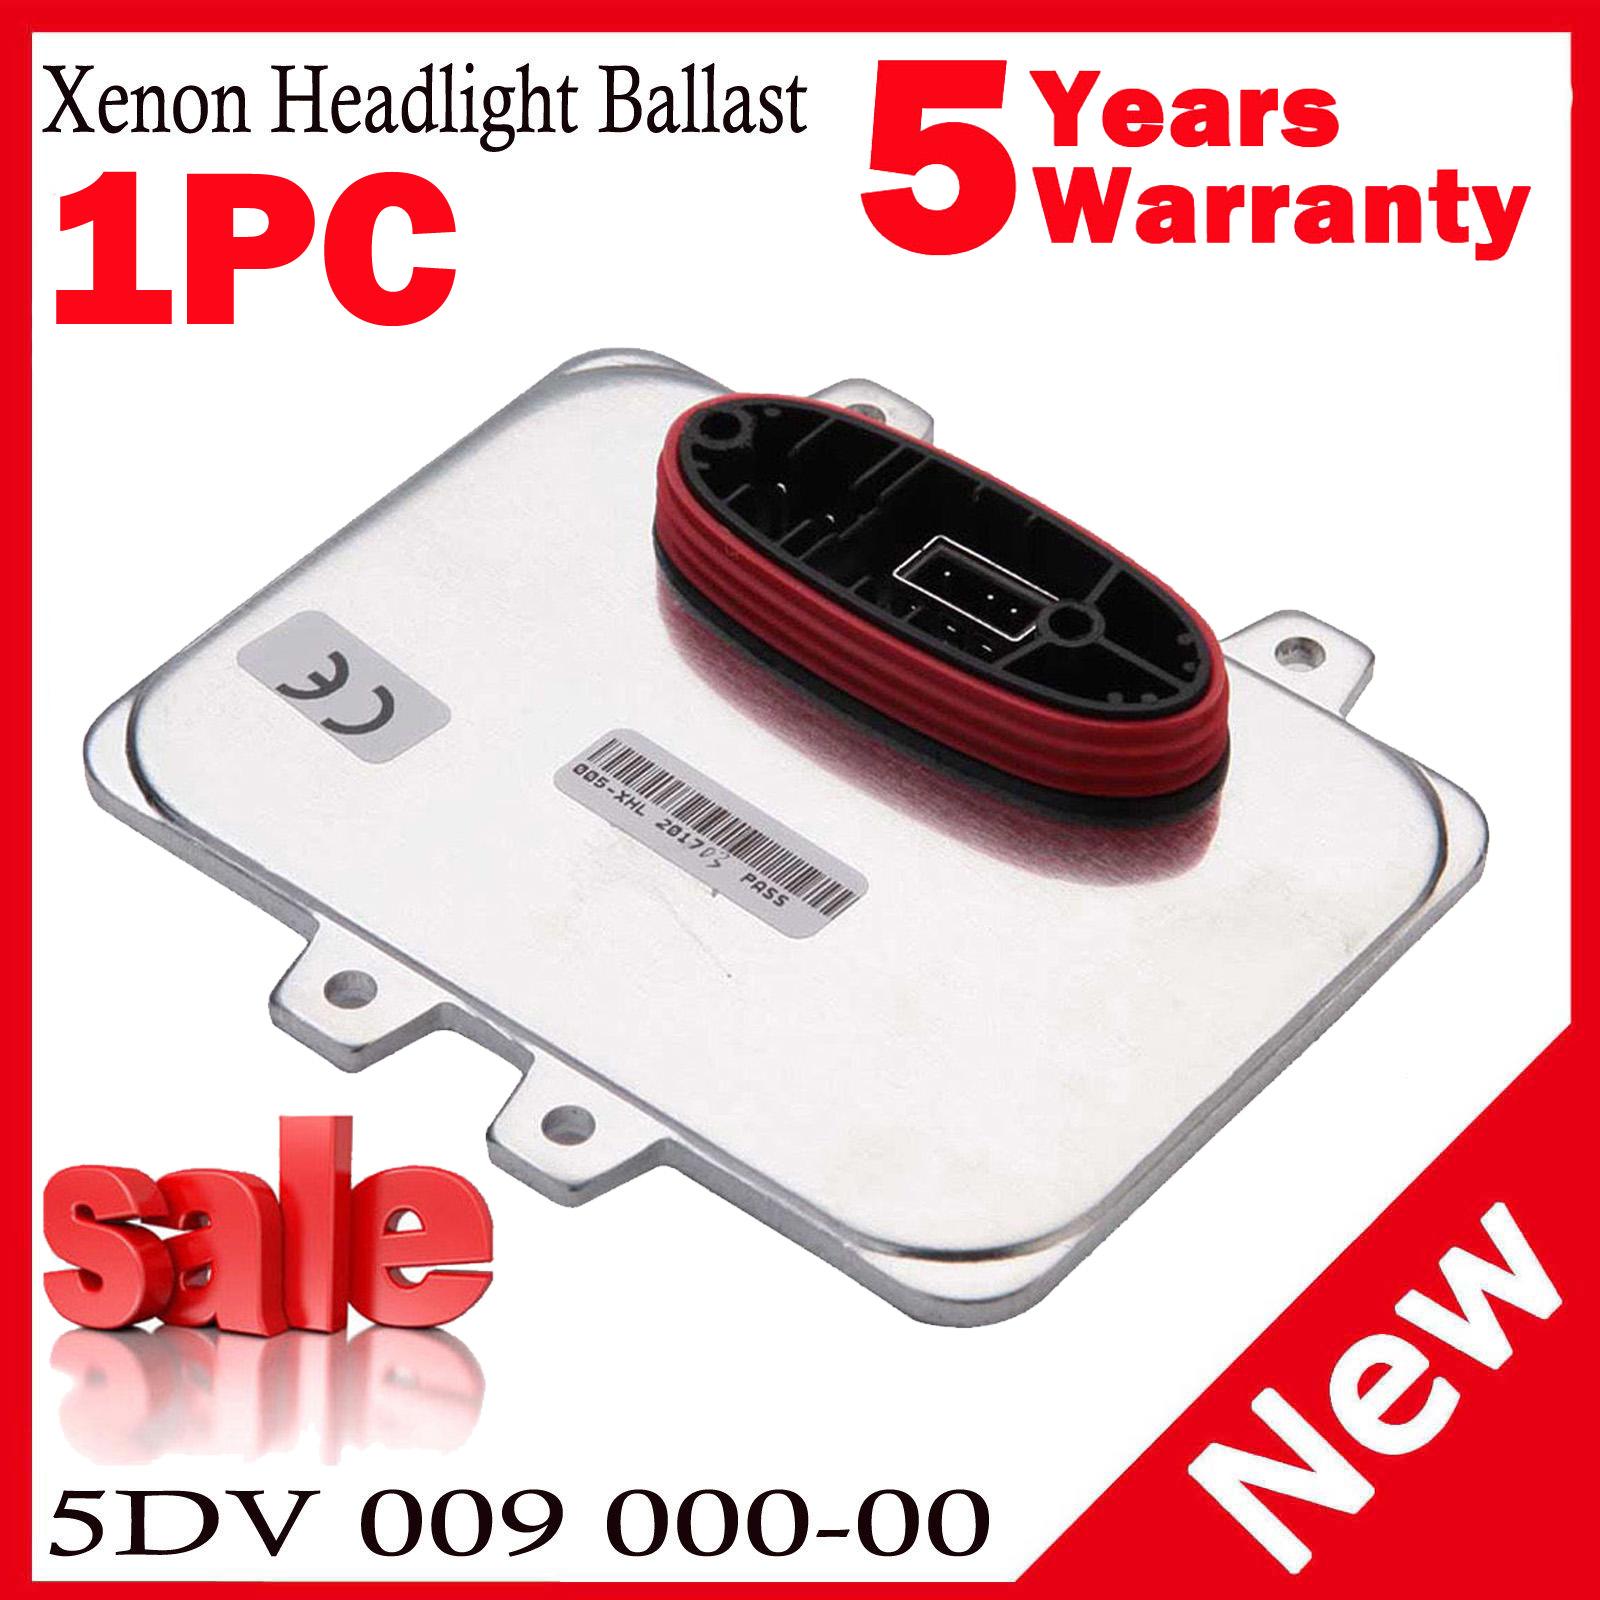 1Pc x Xenon Headlight Ballast Igniter For 2008-2014 Chrysler Town /& Country